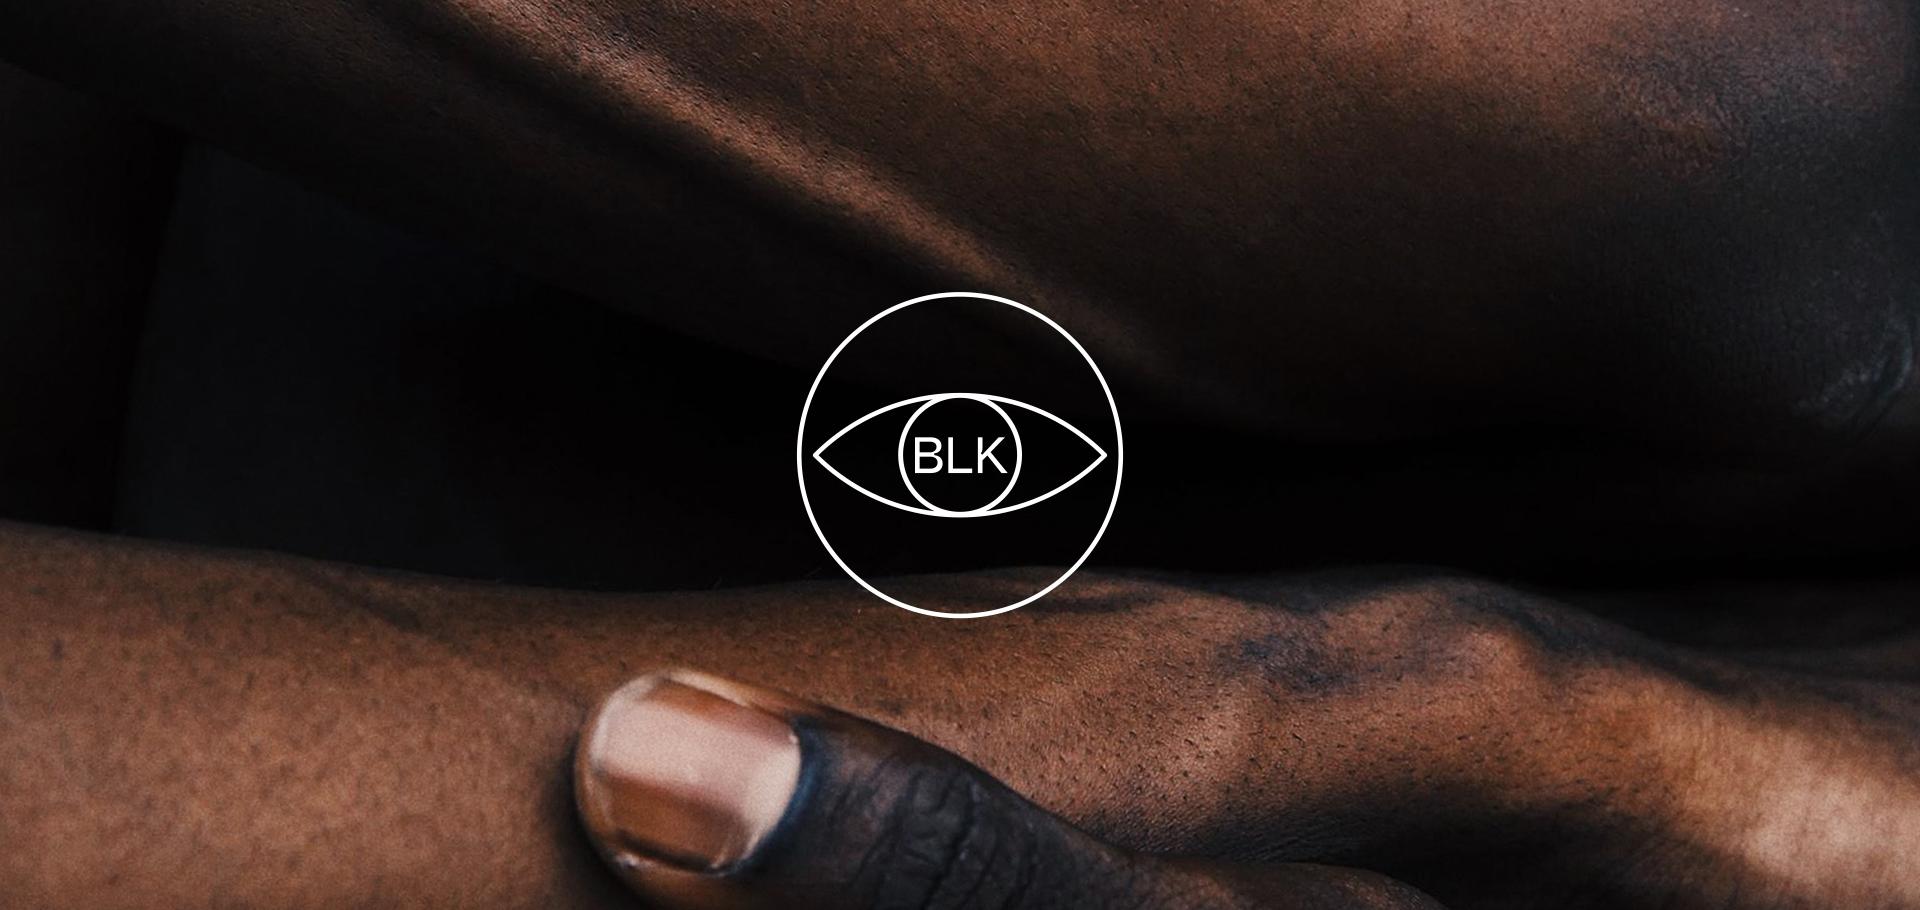 See In Black logo overlay on Juan Veloz Black in America submission